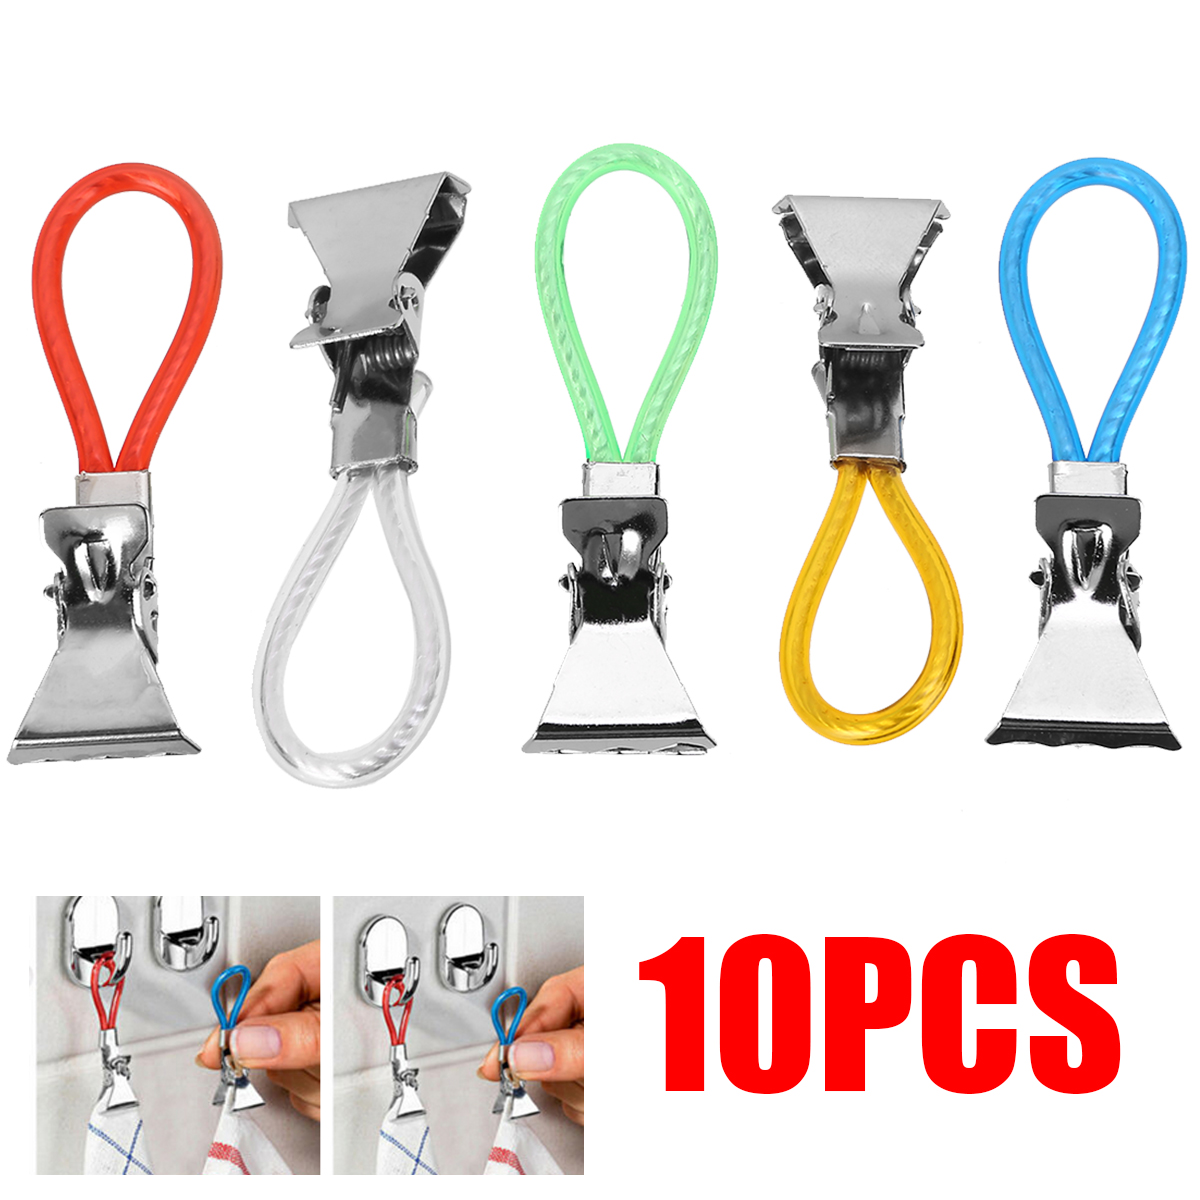 10pcs Multifunctional Towel Clips Travel Kitchen Tea Towels Metal Clip Home Organization Hooks Mayitr